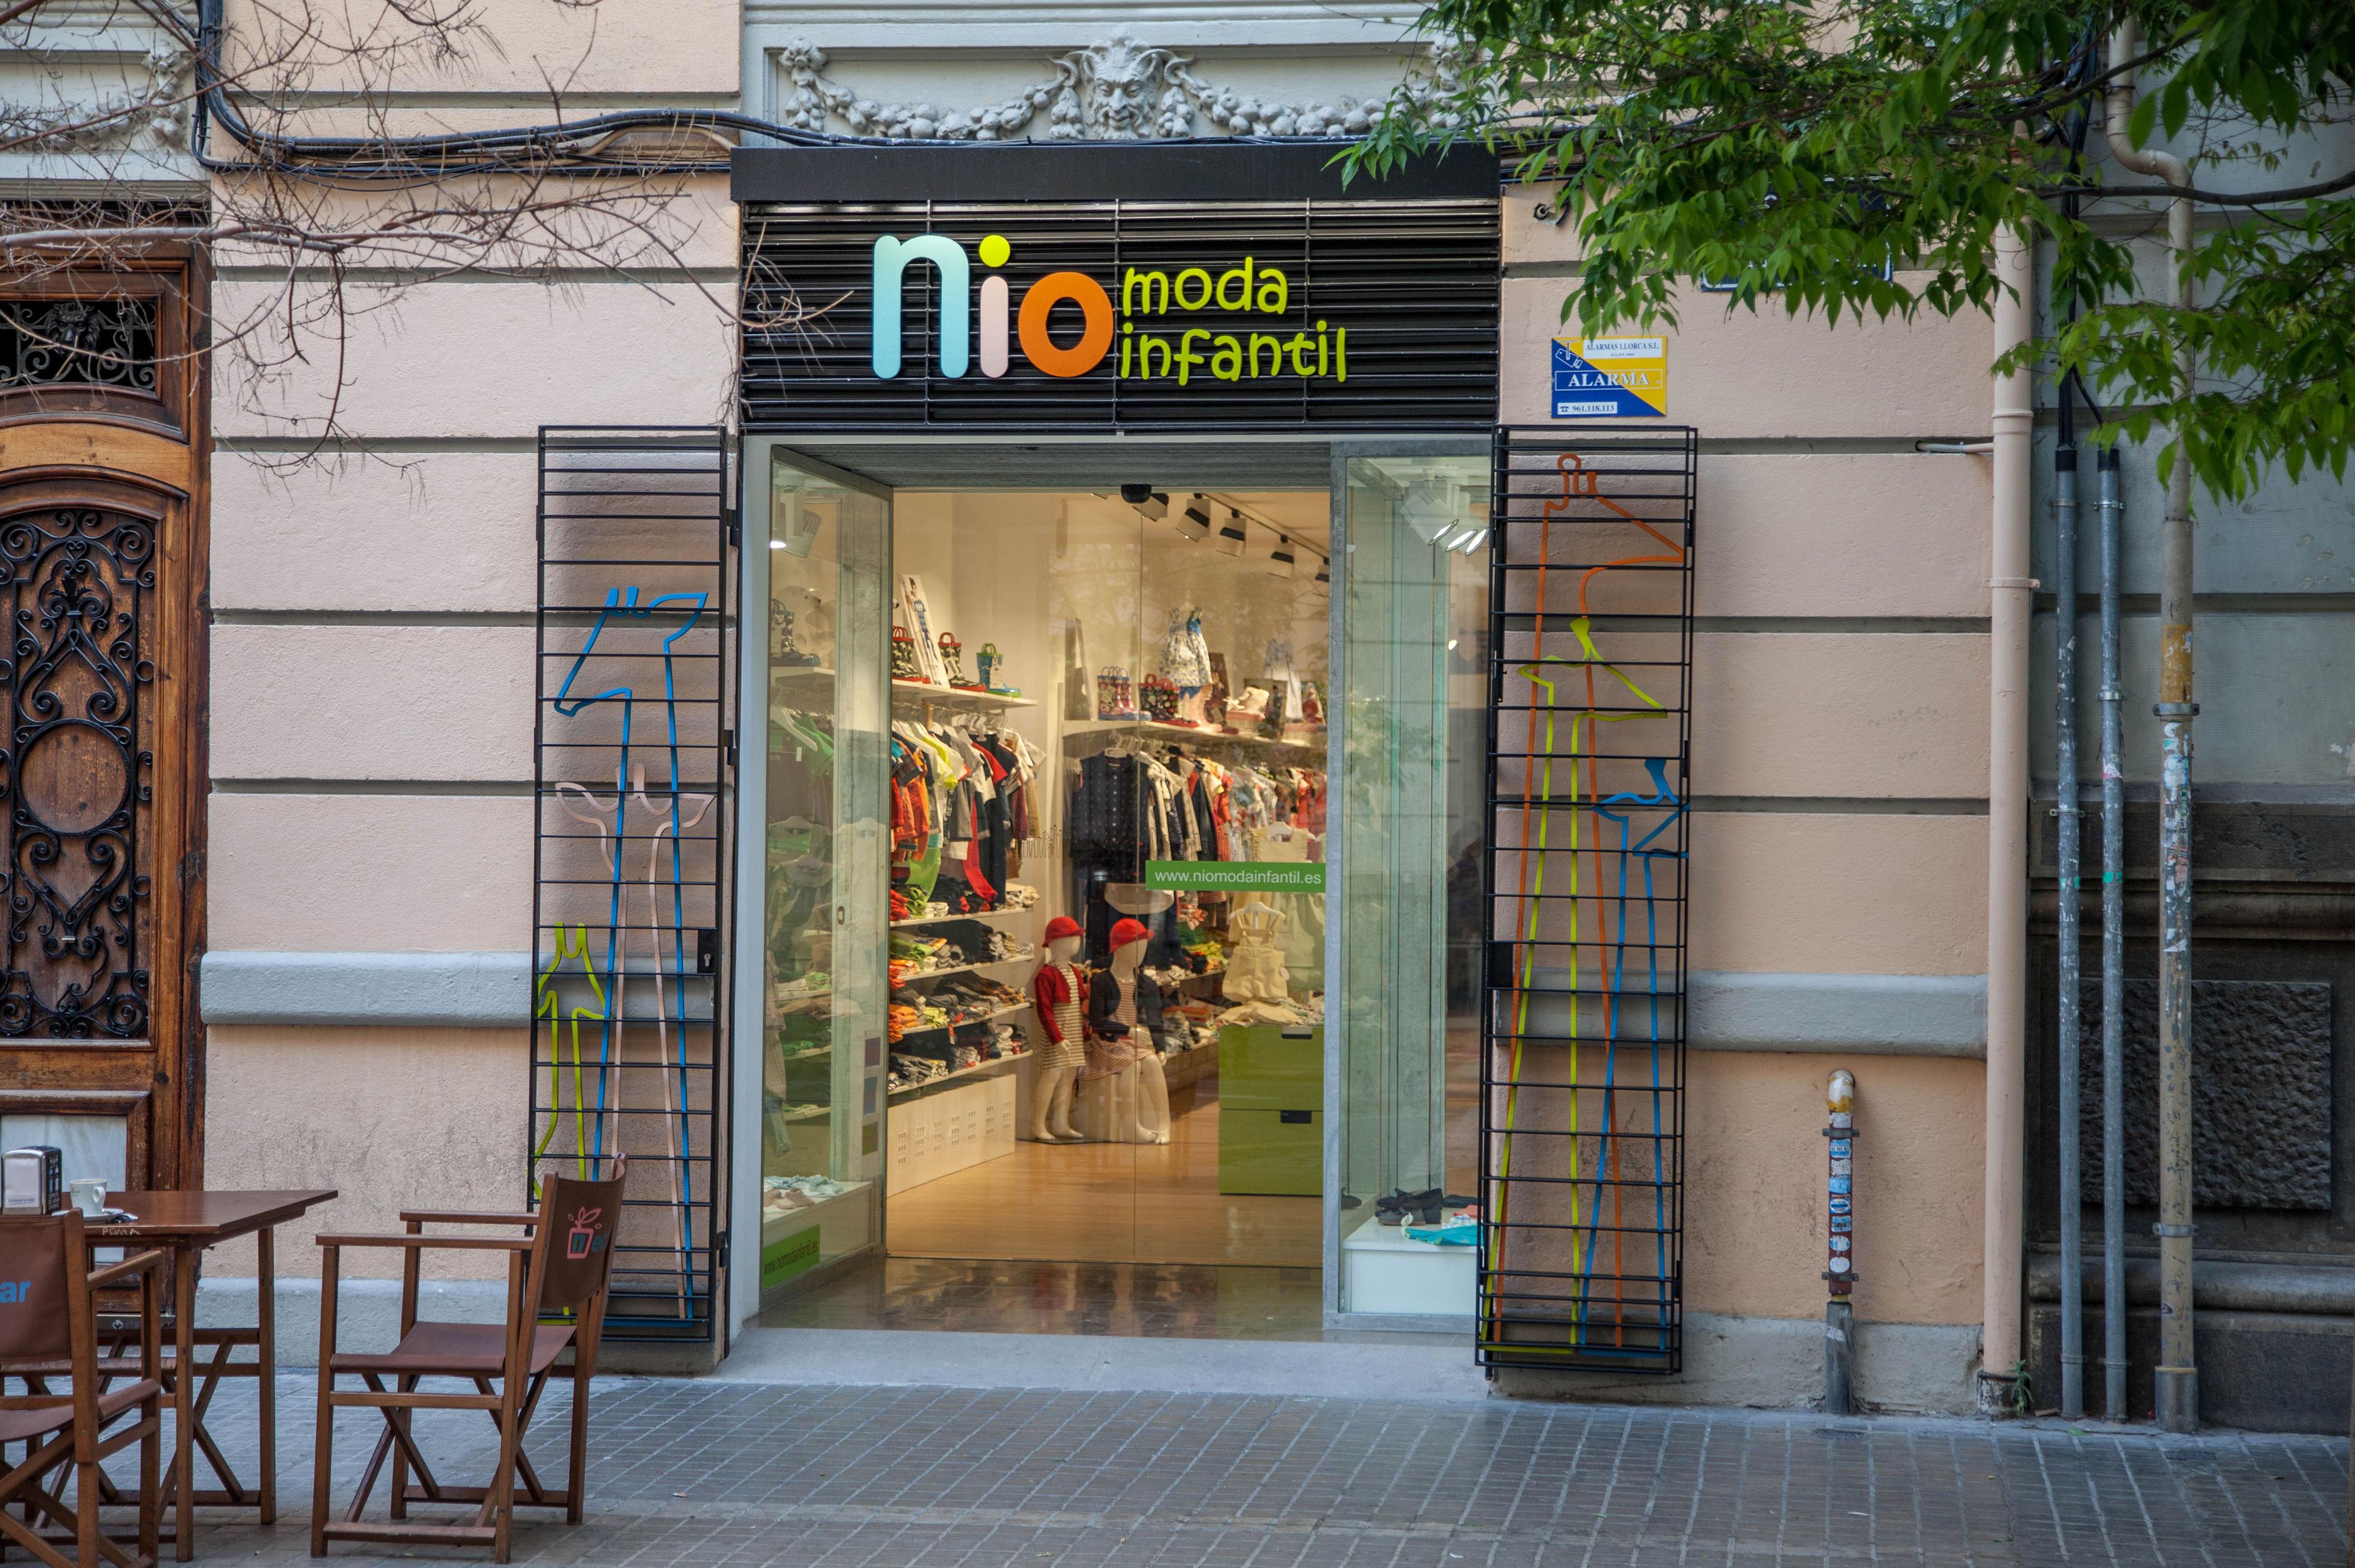 Foto 1 de Completo catálogo de moda infantil de 0 a 14 años en València | Nio Moda Infantil